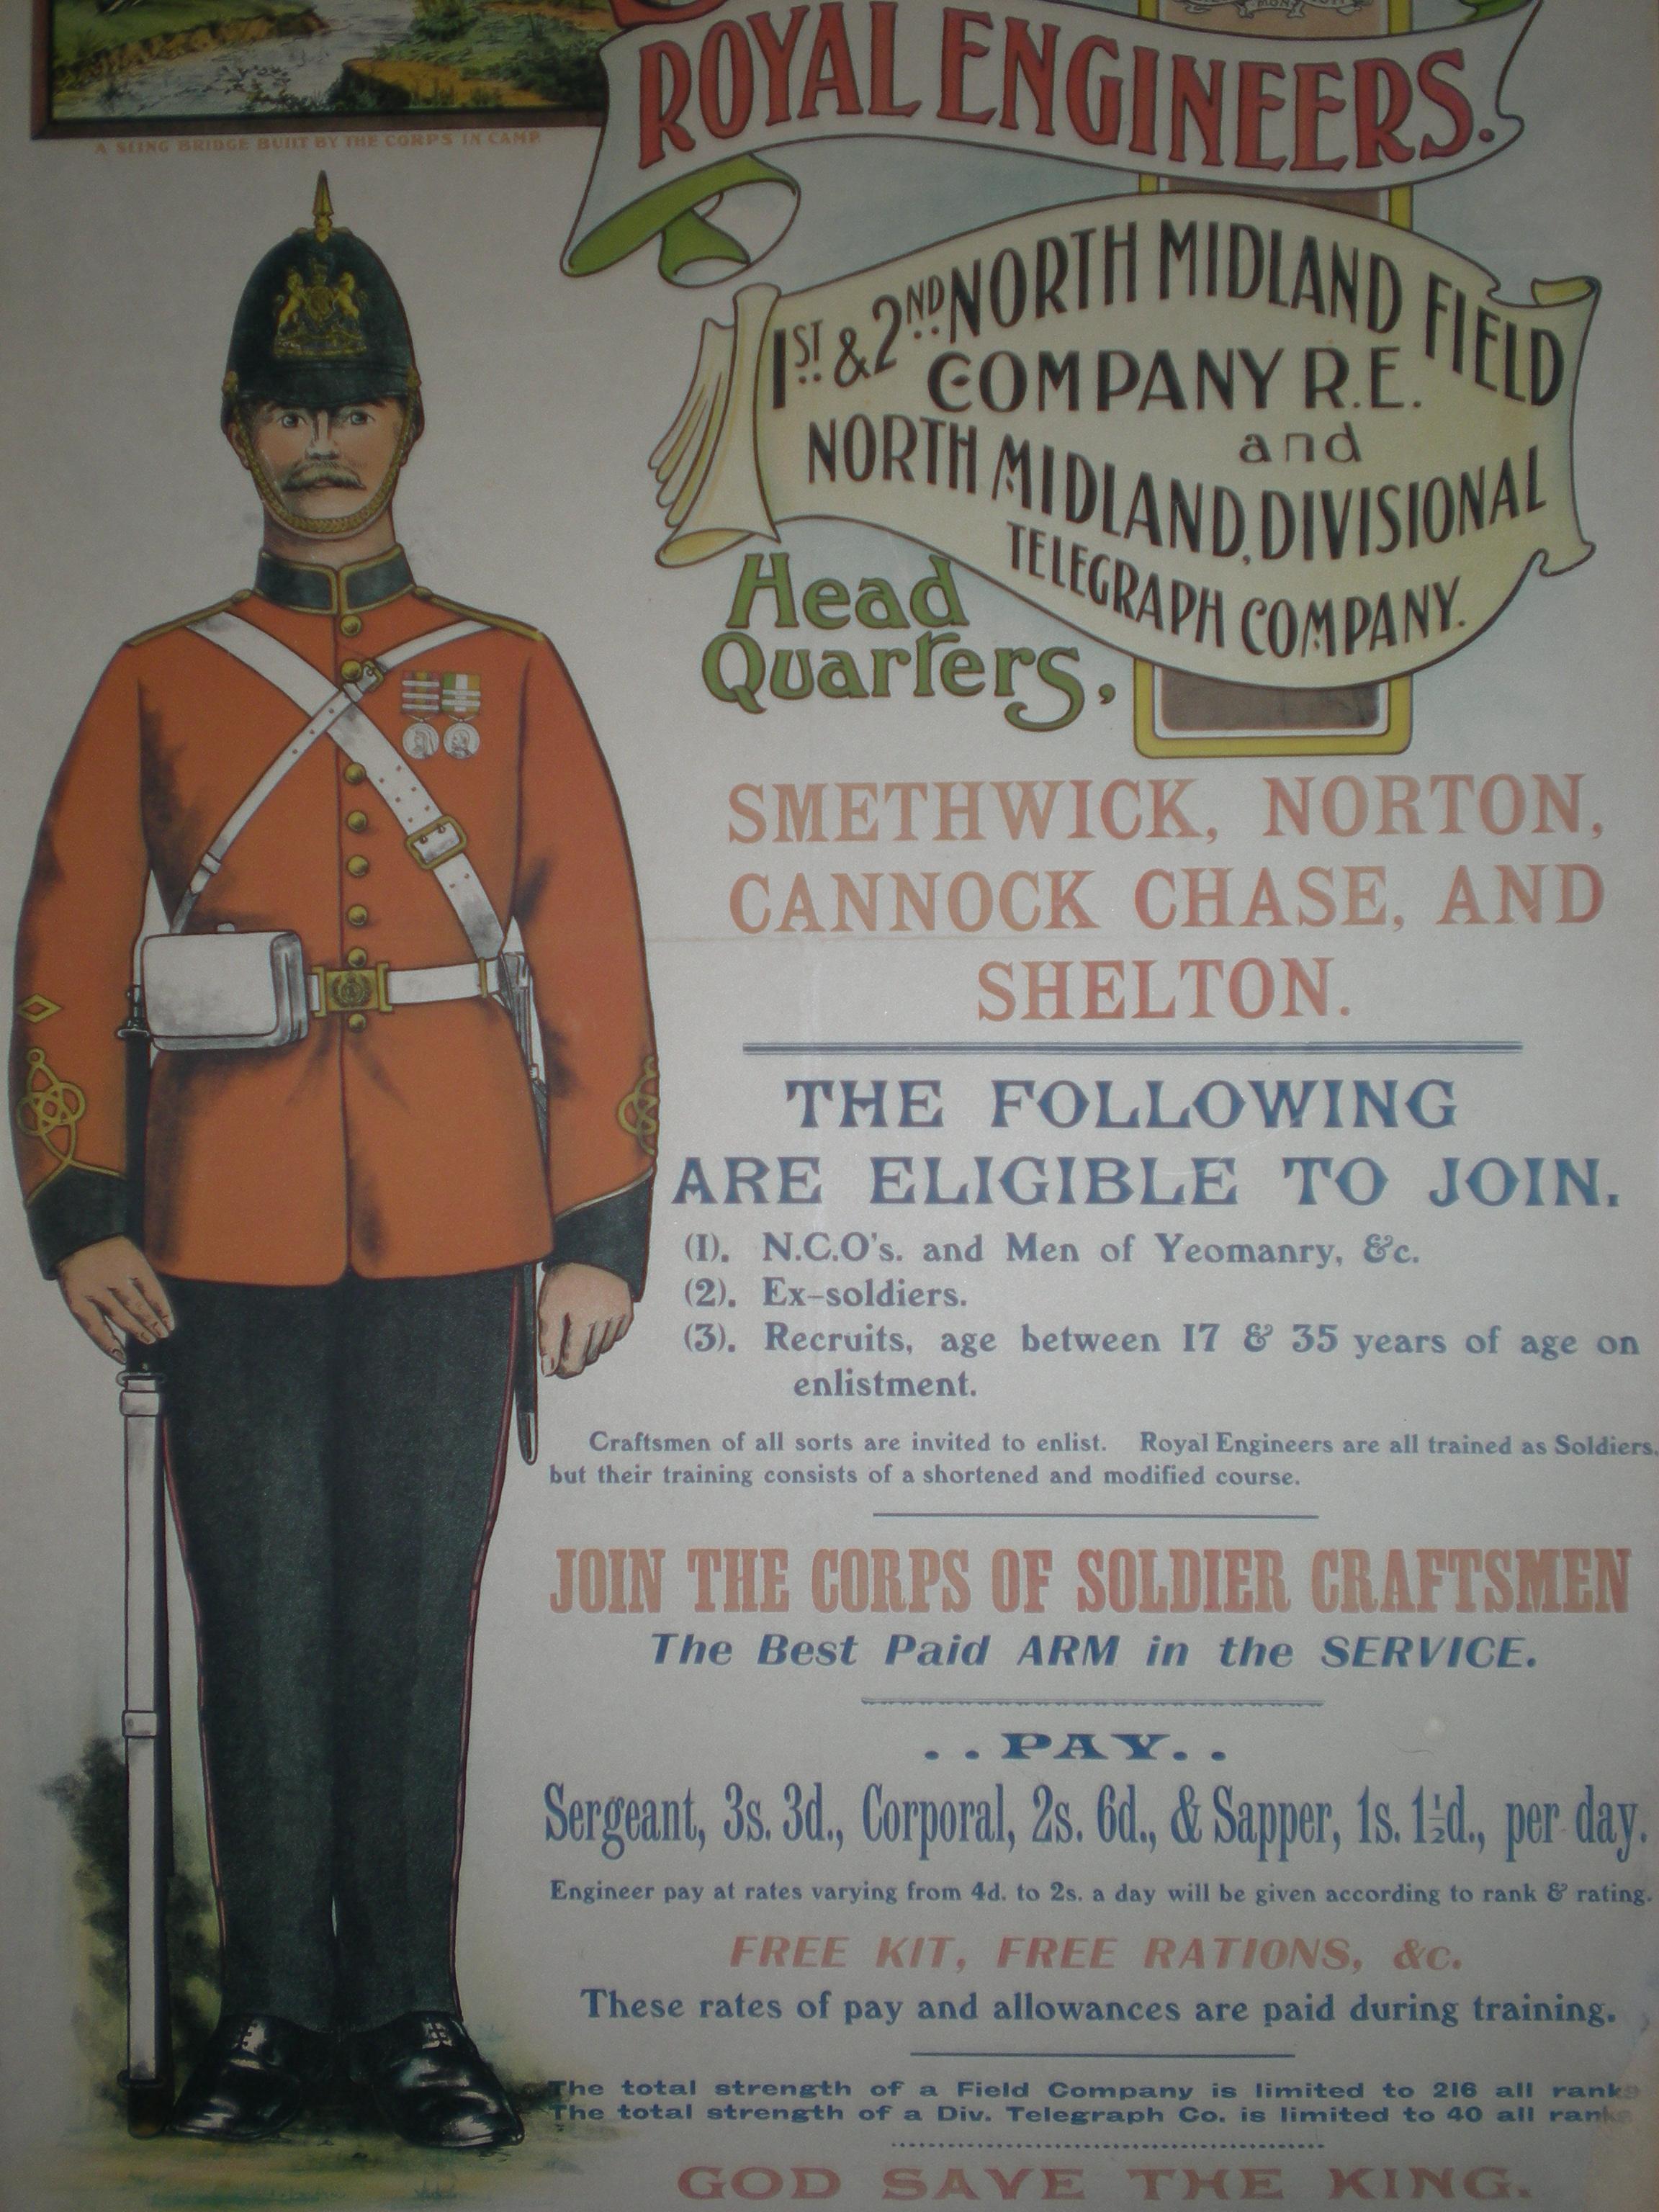 Royal Engineers | Military Wiki | FANDOM powered by Wikia